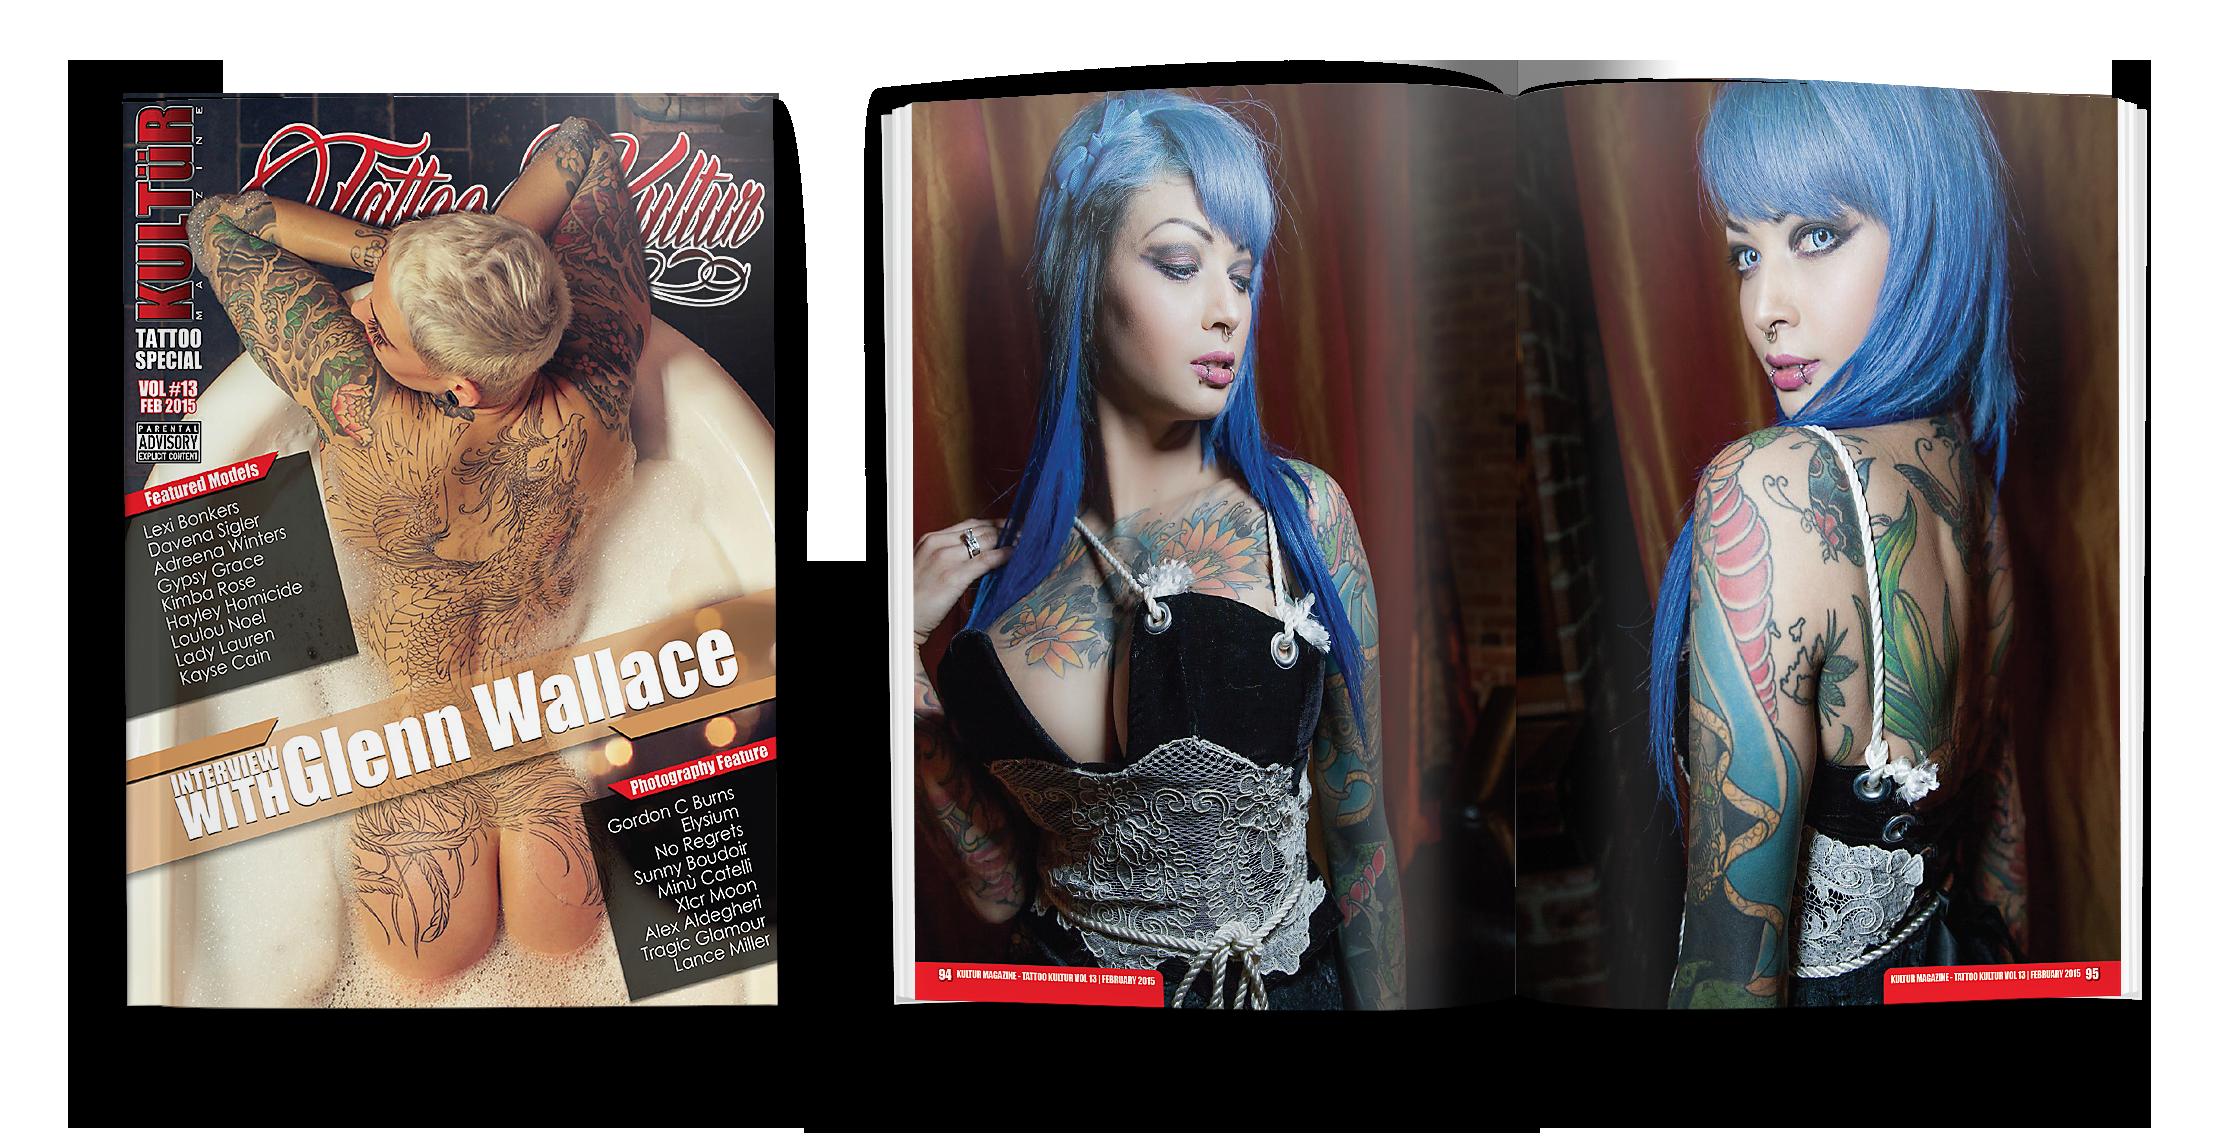 Kultur_Magazine_VOL_13_2_Render5.png